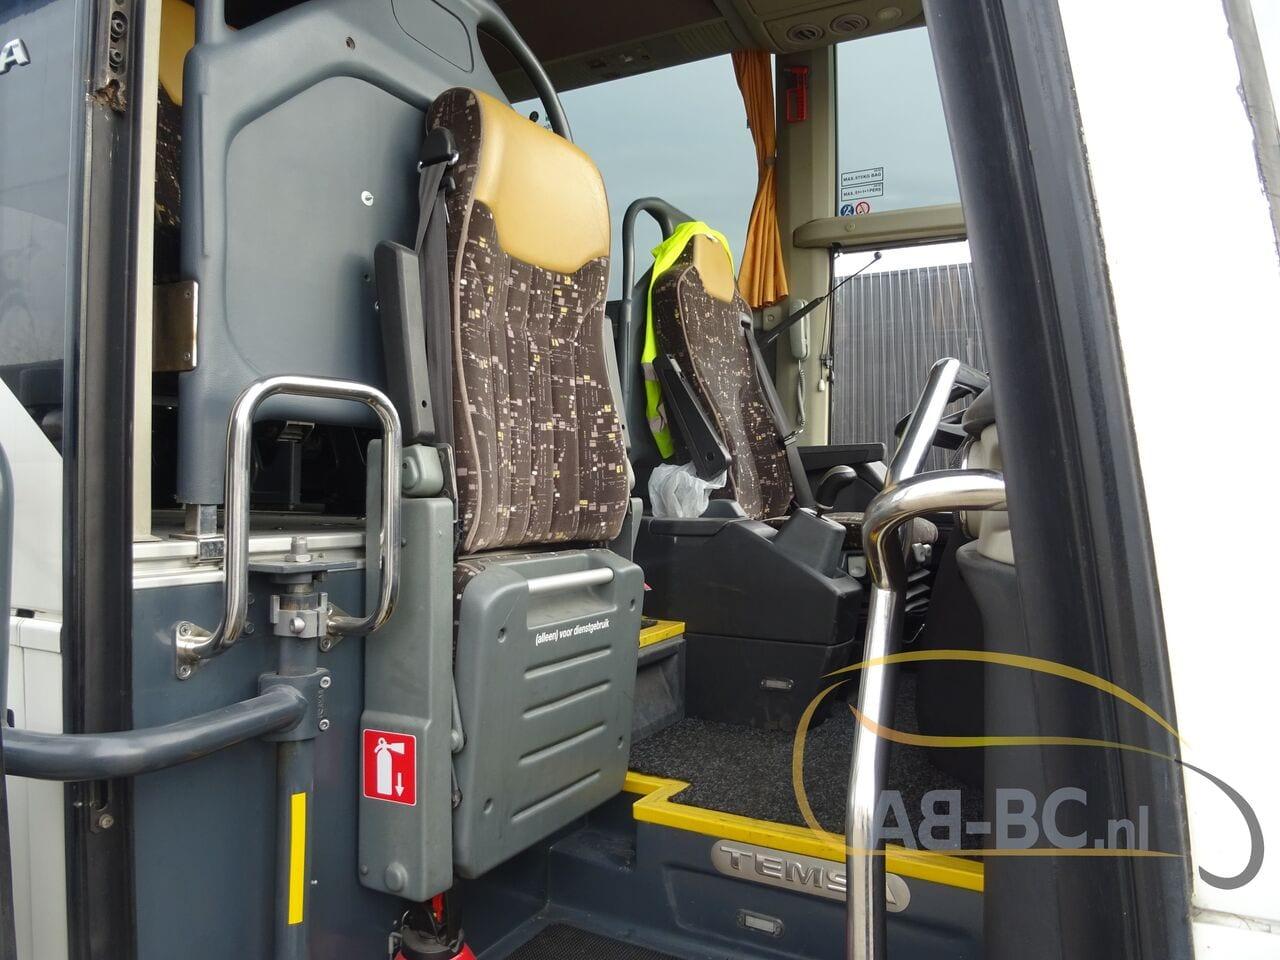 coach-busTEMSA-Safari-HD-51-Seats-EURO5-12-MTR---1614266473998501529_big_b6753bfc2a903e9210f58ee7b6683fe6--19052917224730818200